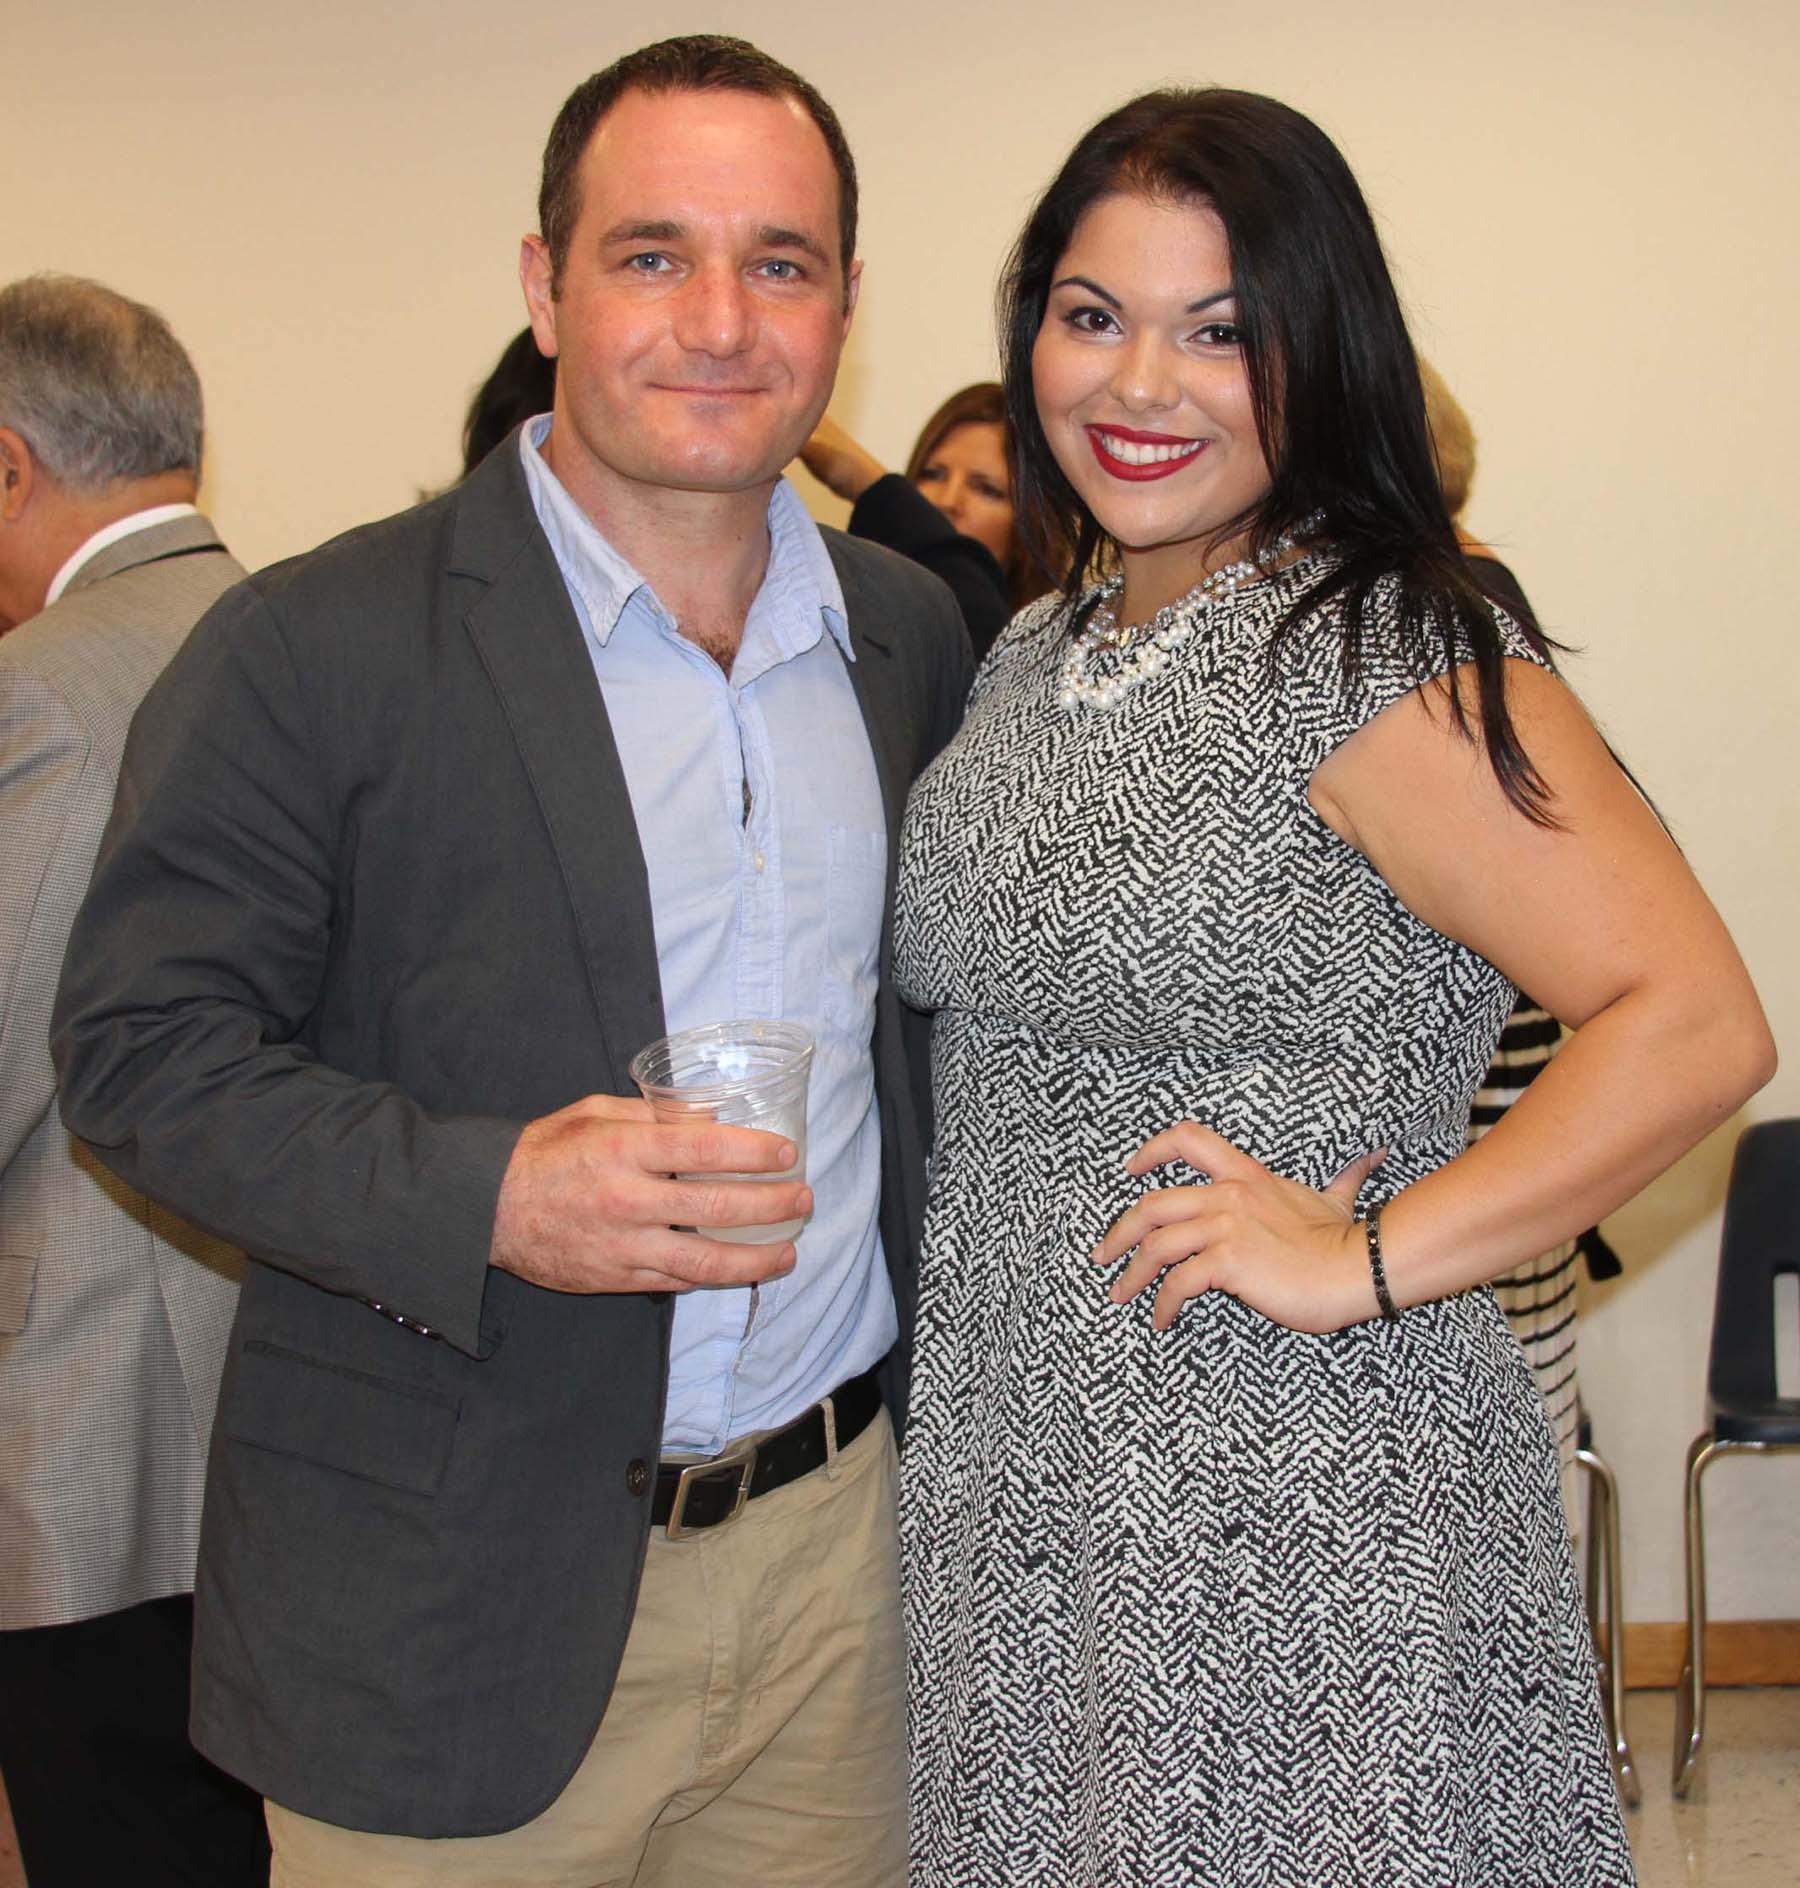 Dr. Christian Parenti, Jenny Sancho